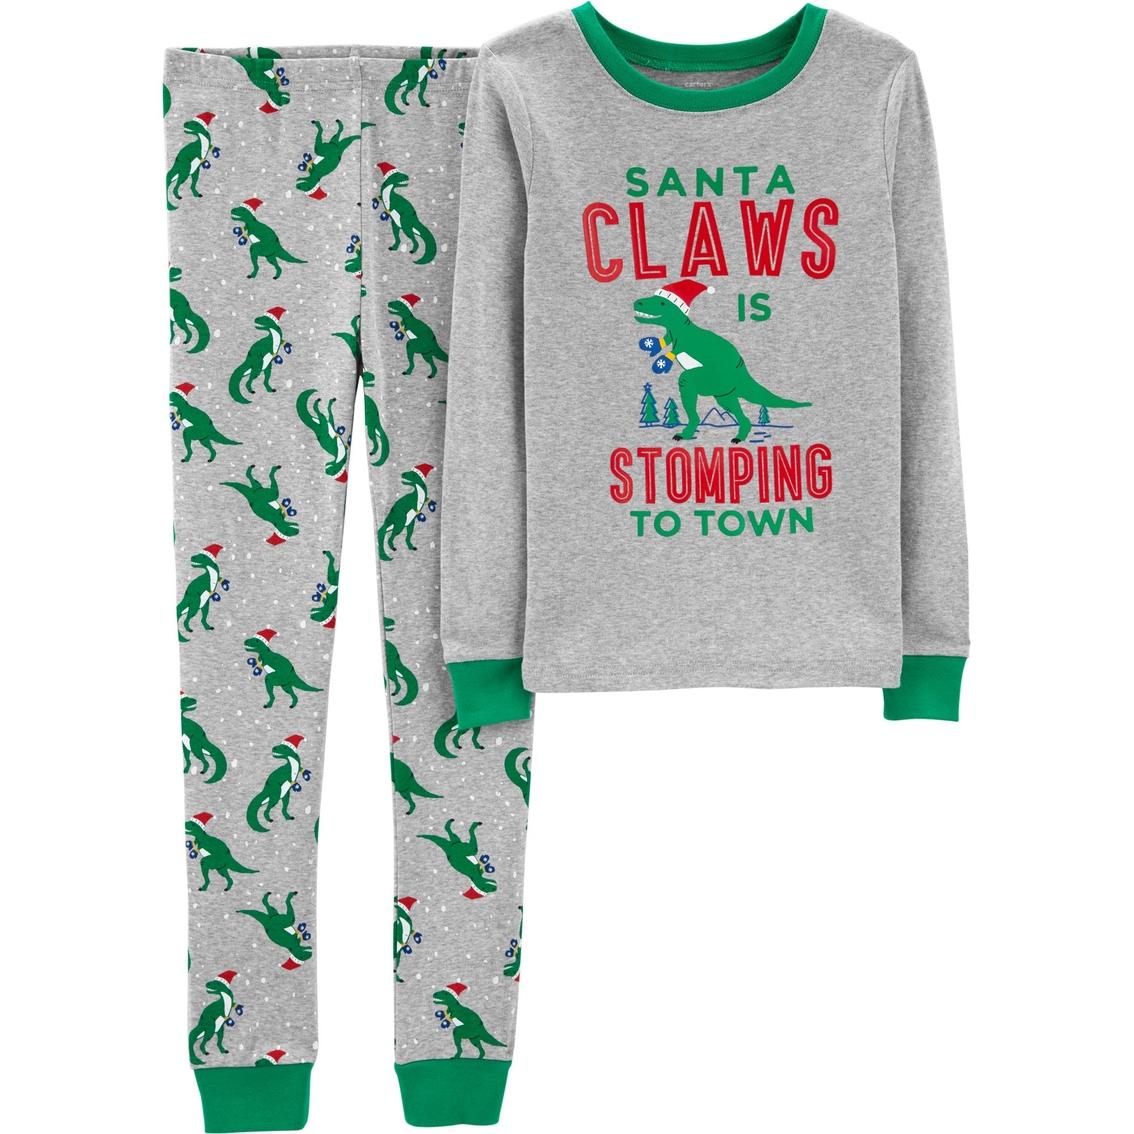 20f3535bc Carters Little Boys Santa Claws 2 Pc. Pajamas Set